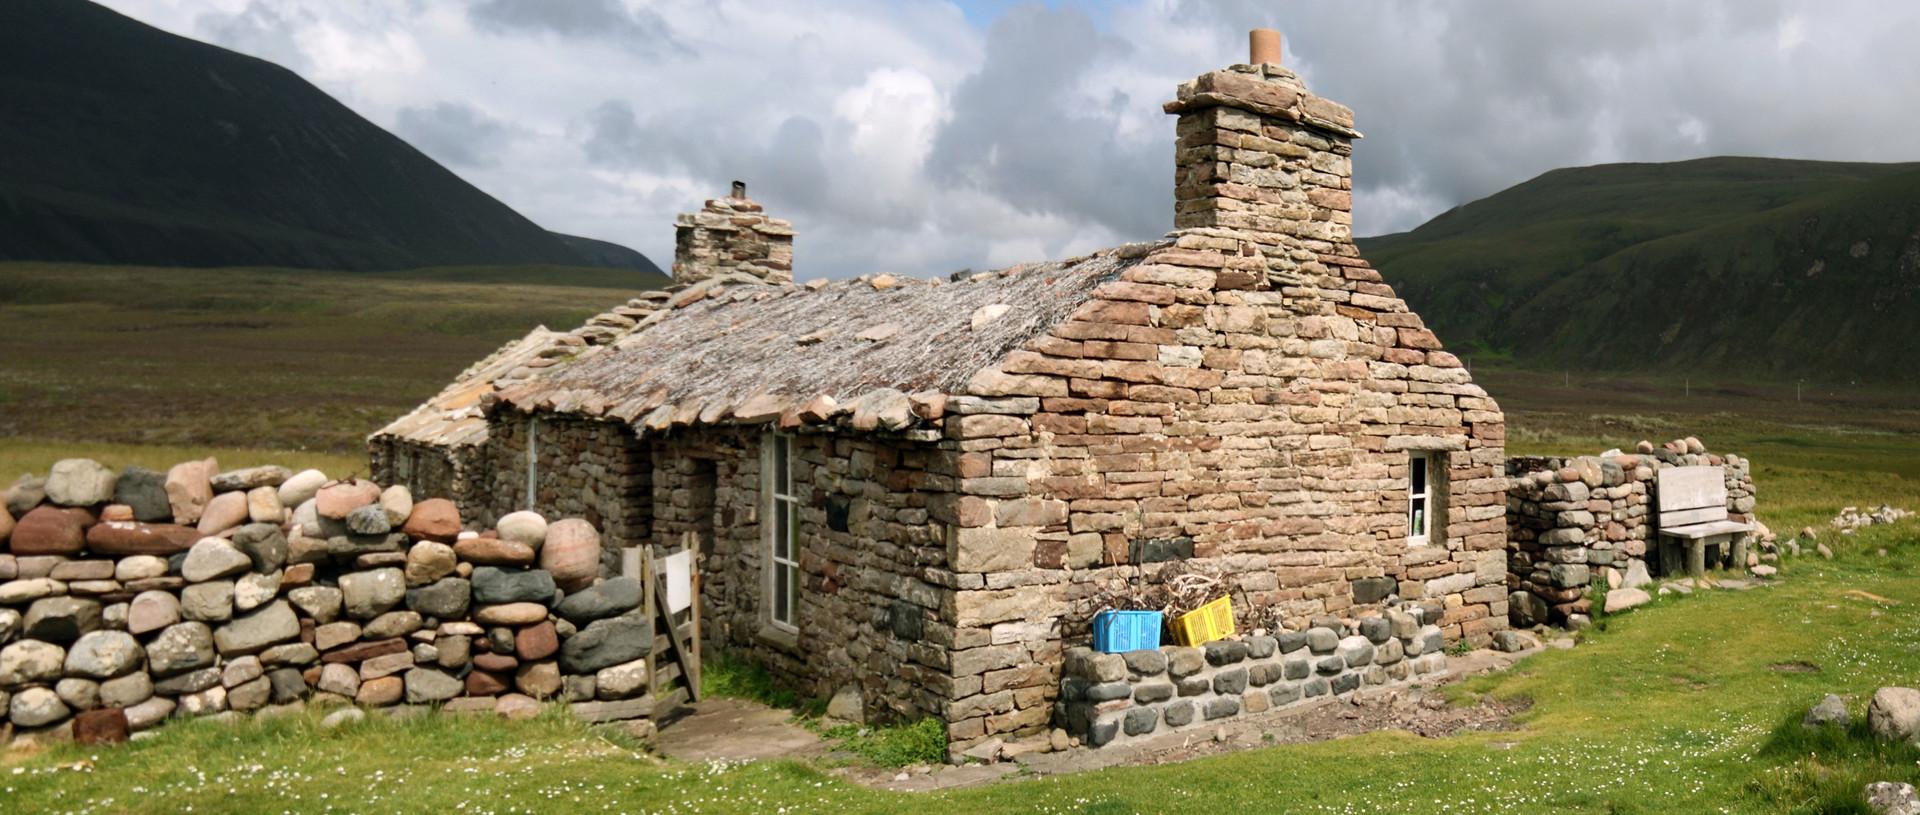 Burnmouth cottage, Hoy, Orkney